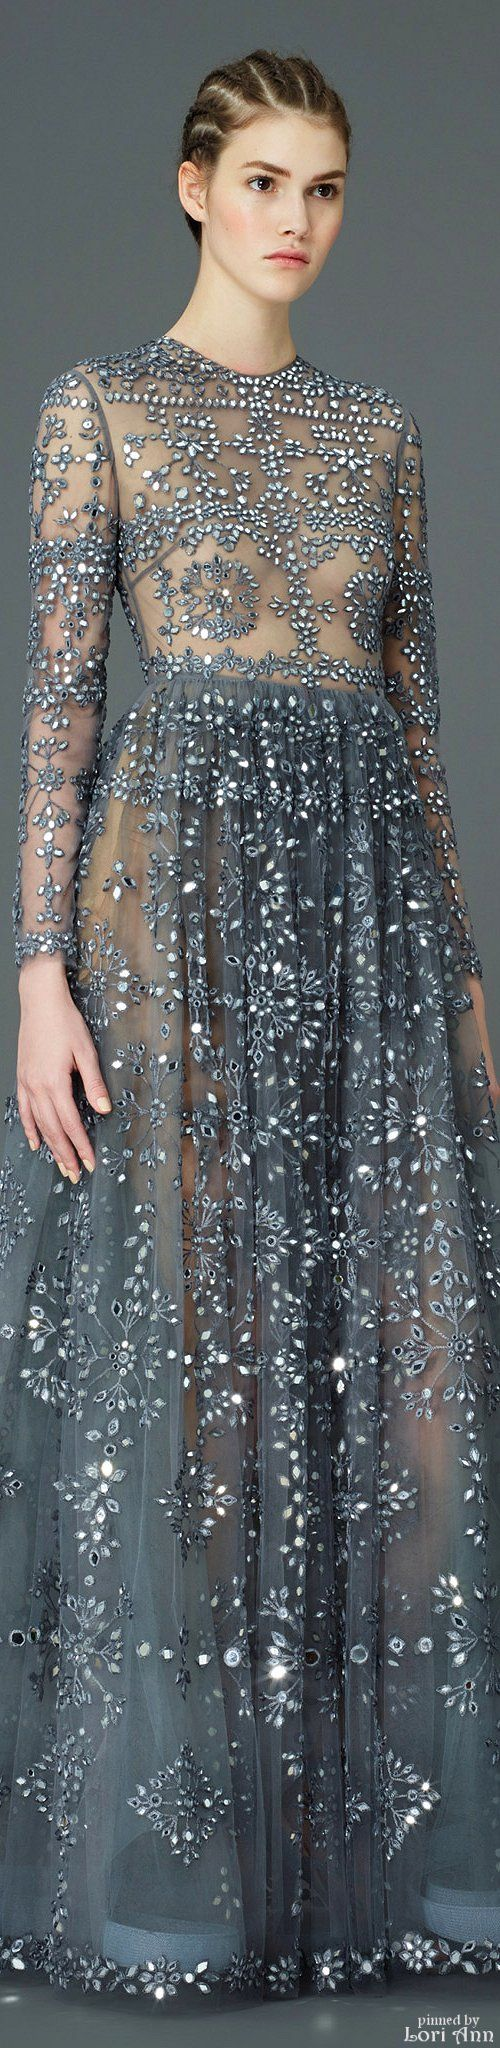 Valentino ~ Long Sleeve Evening Dress, Silver/Grey, Pre-Fall 2015